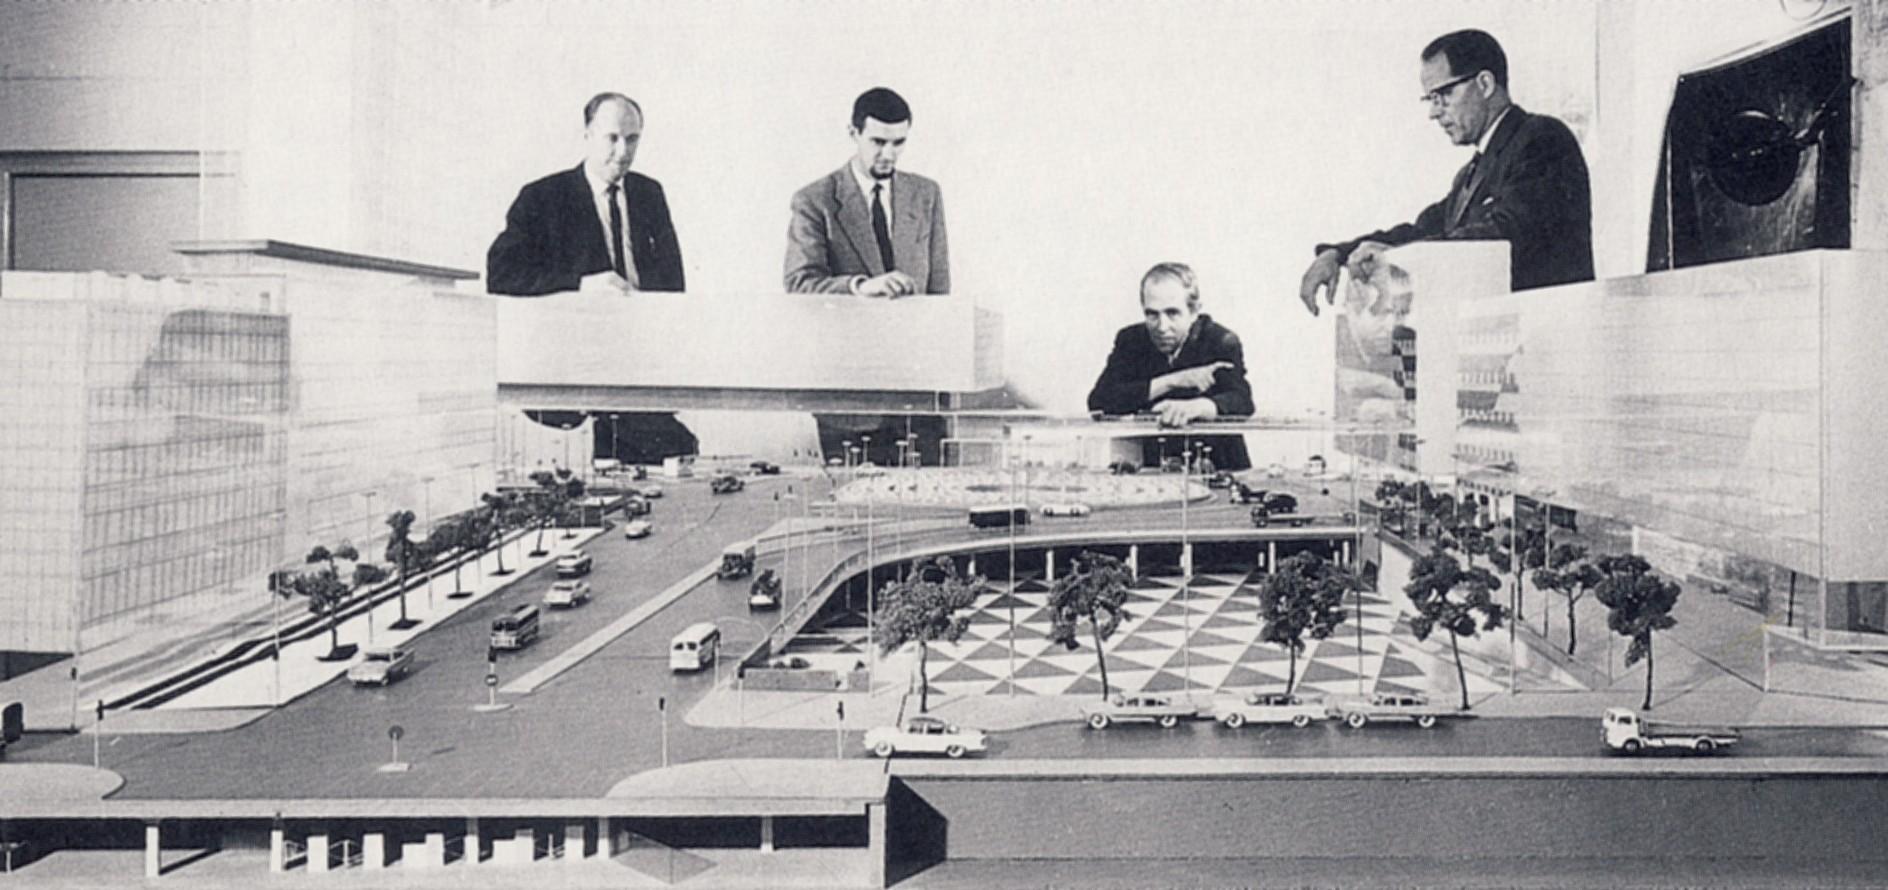 Modell architektur - Architektur plan ...